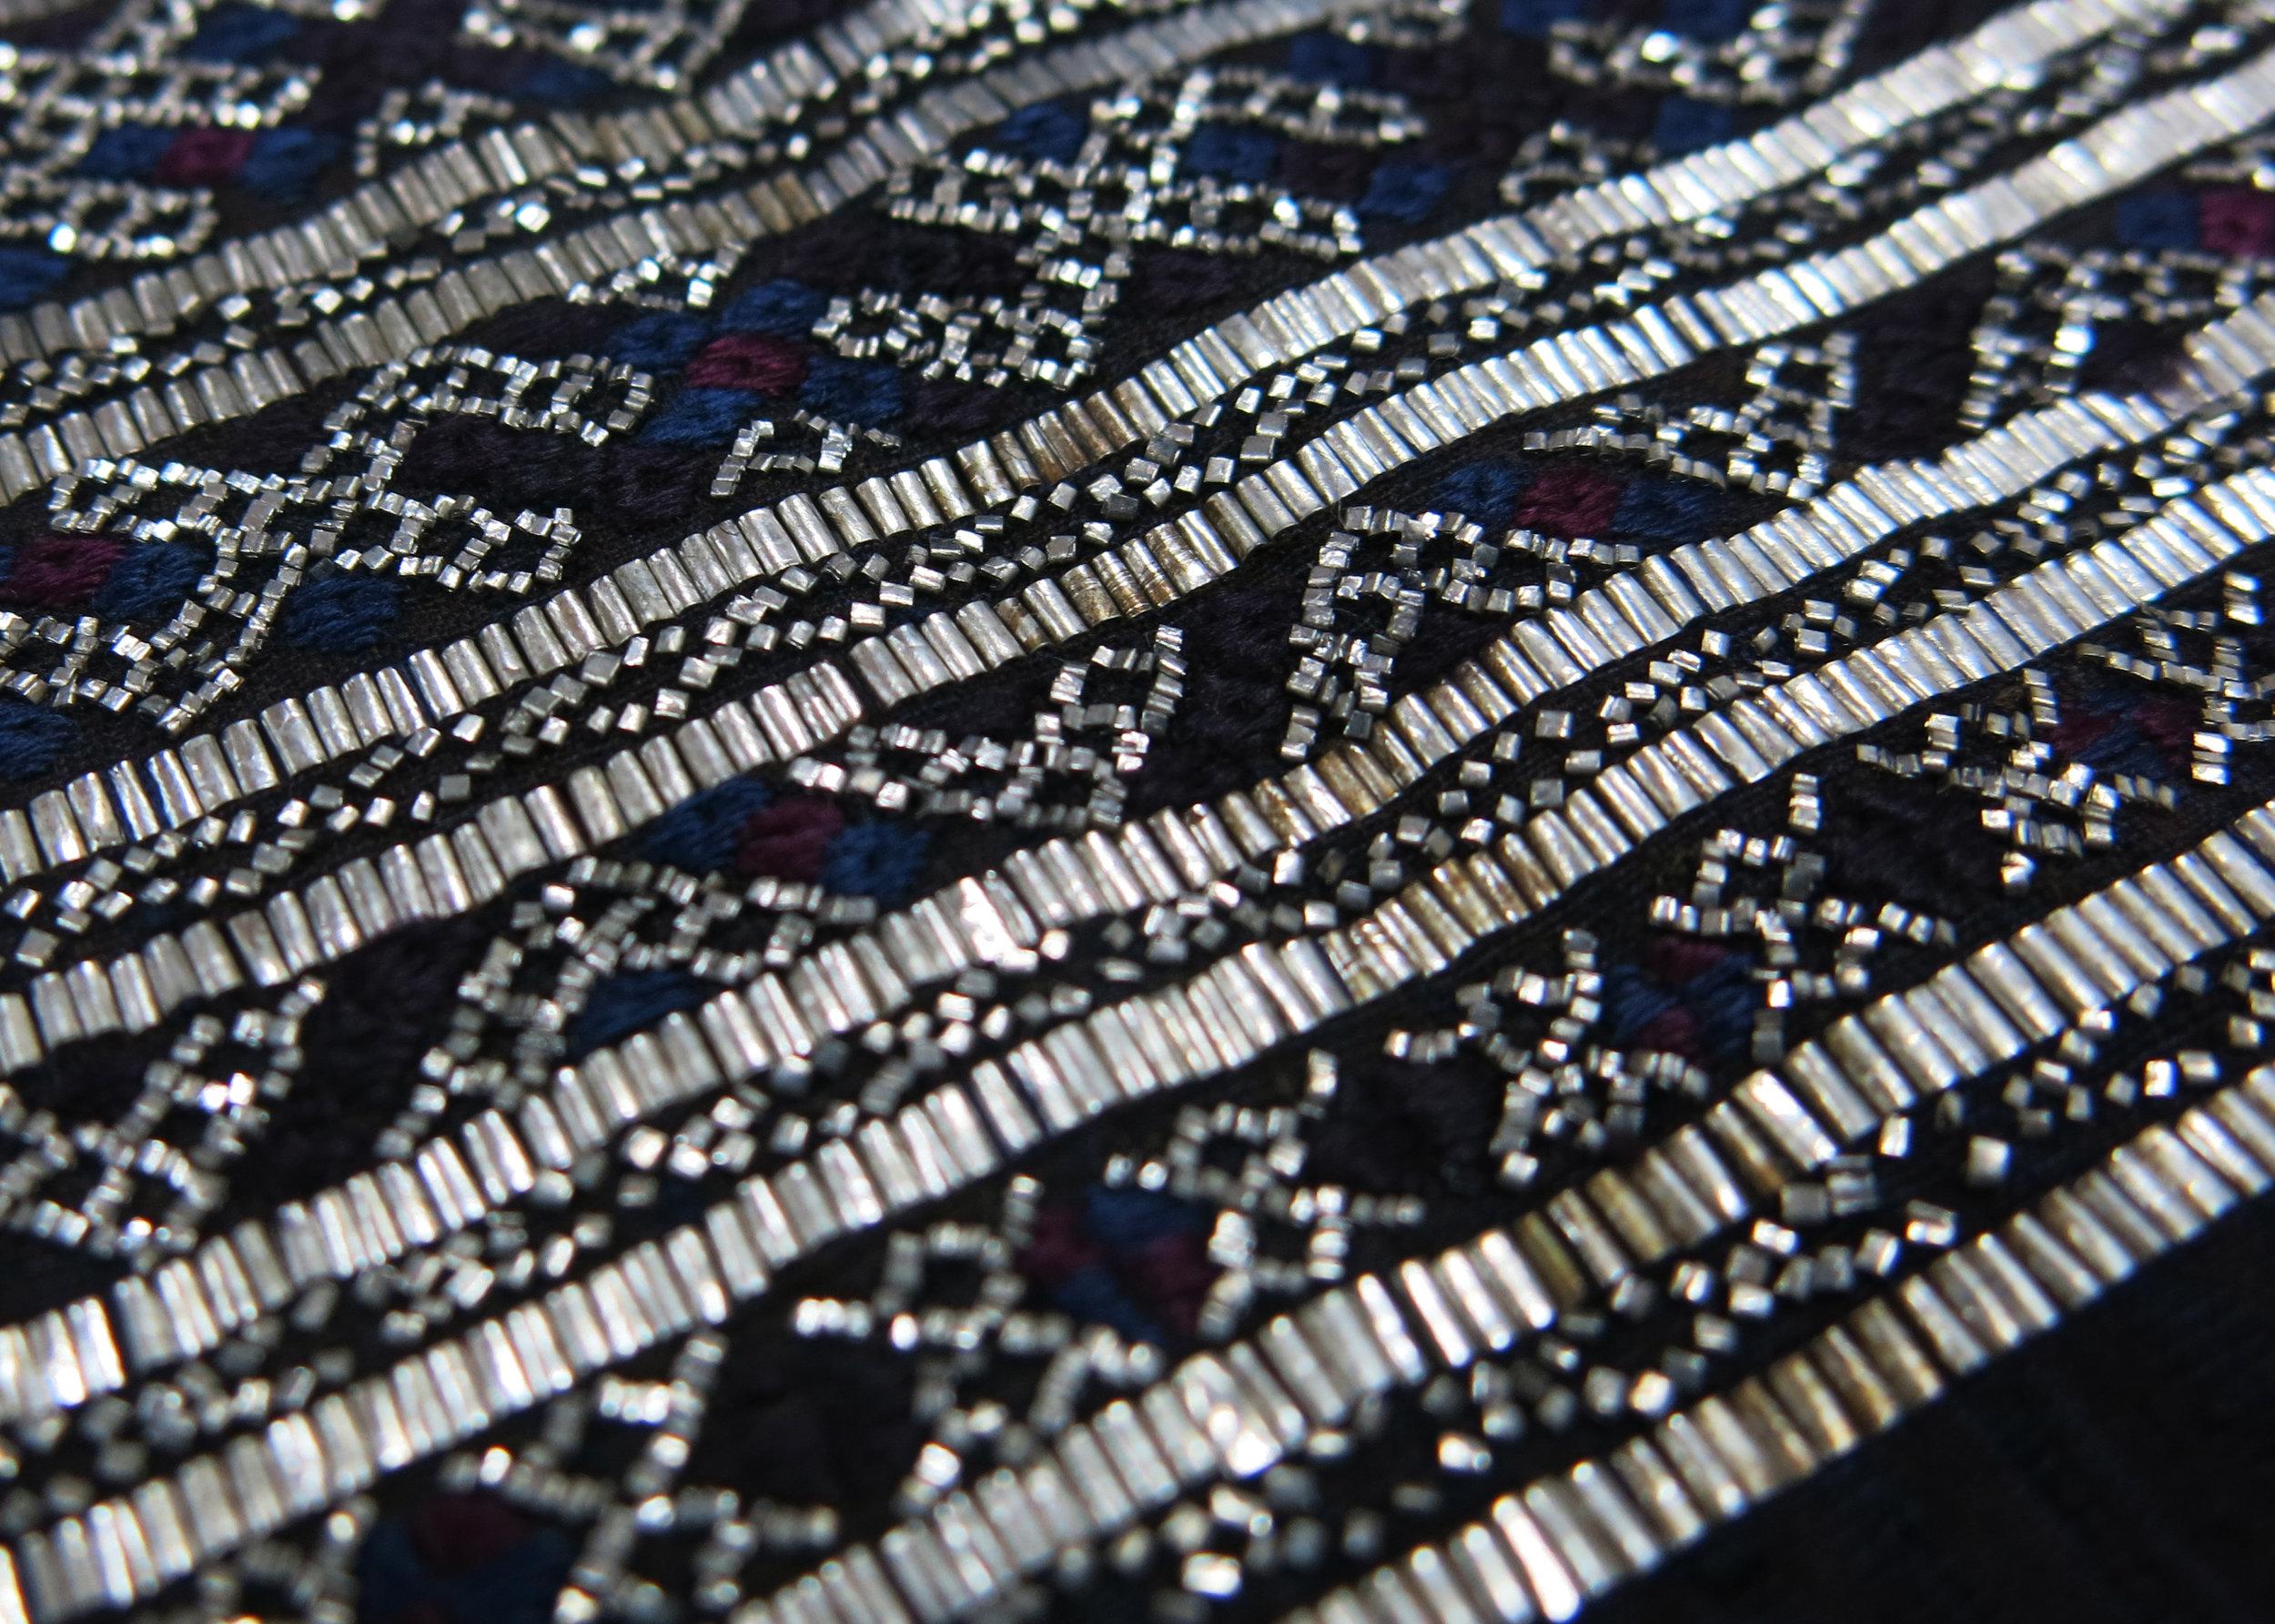 miao-tin-gimp-embroidery-in-zhanliu-china26